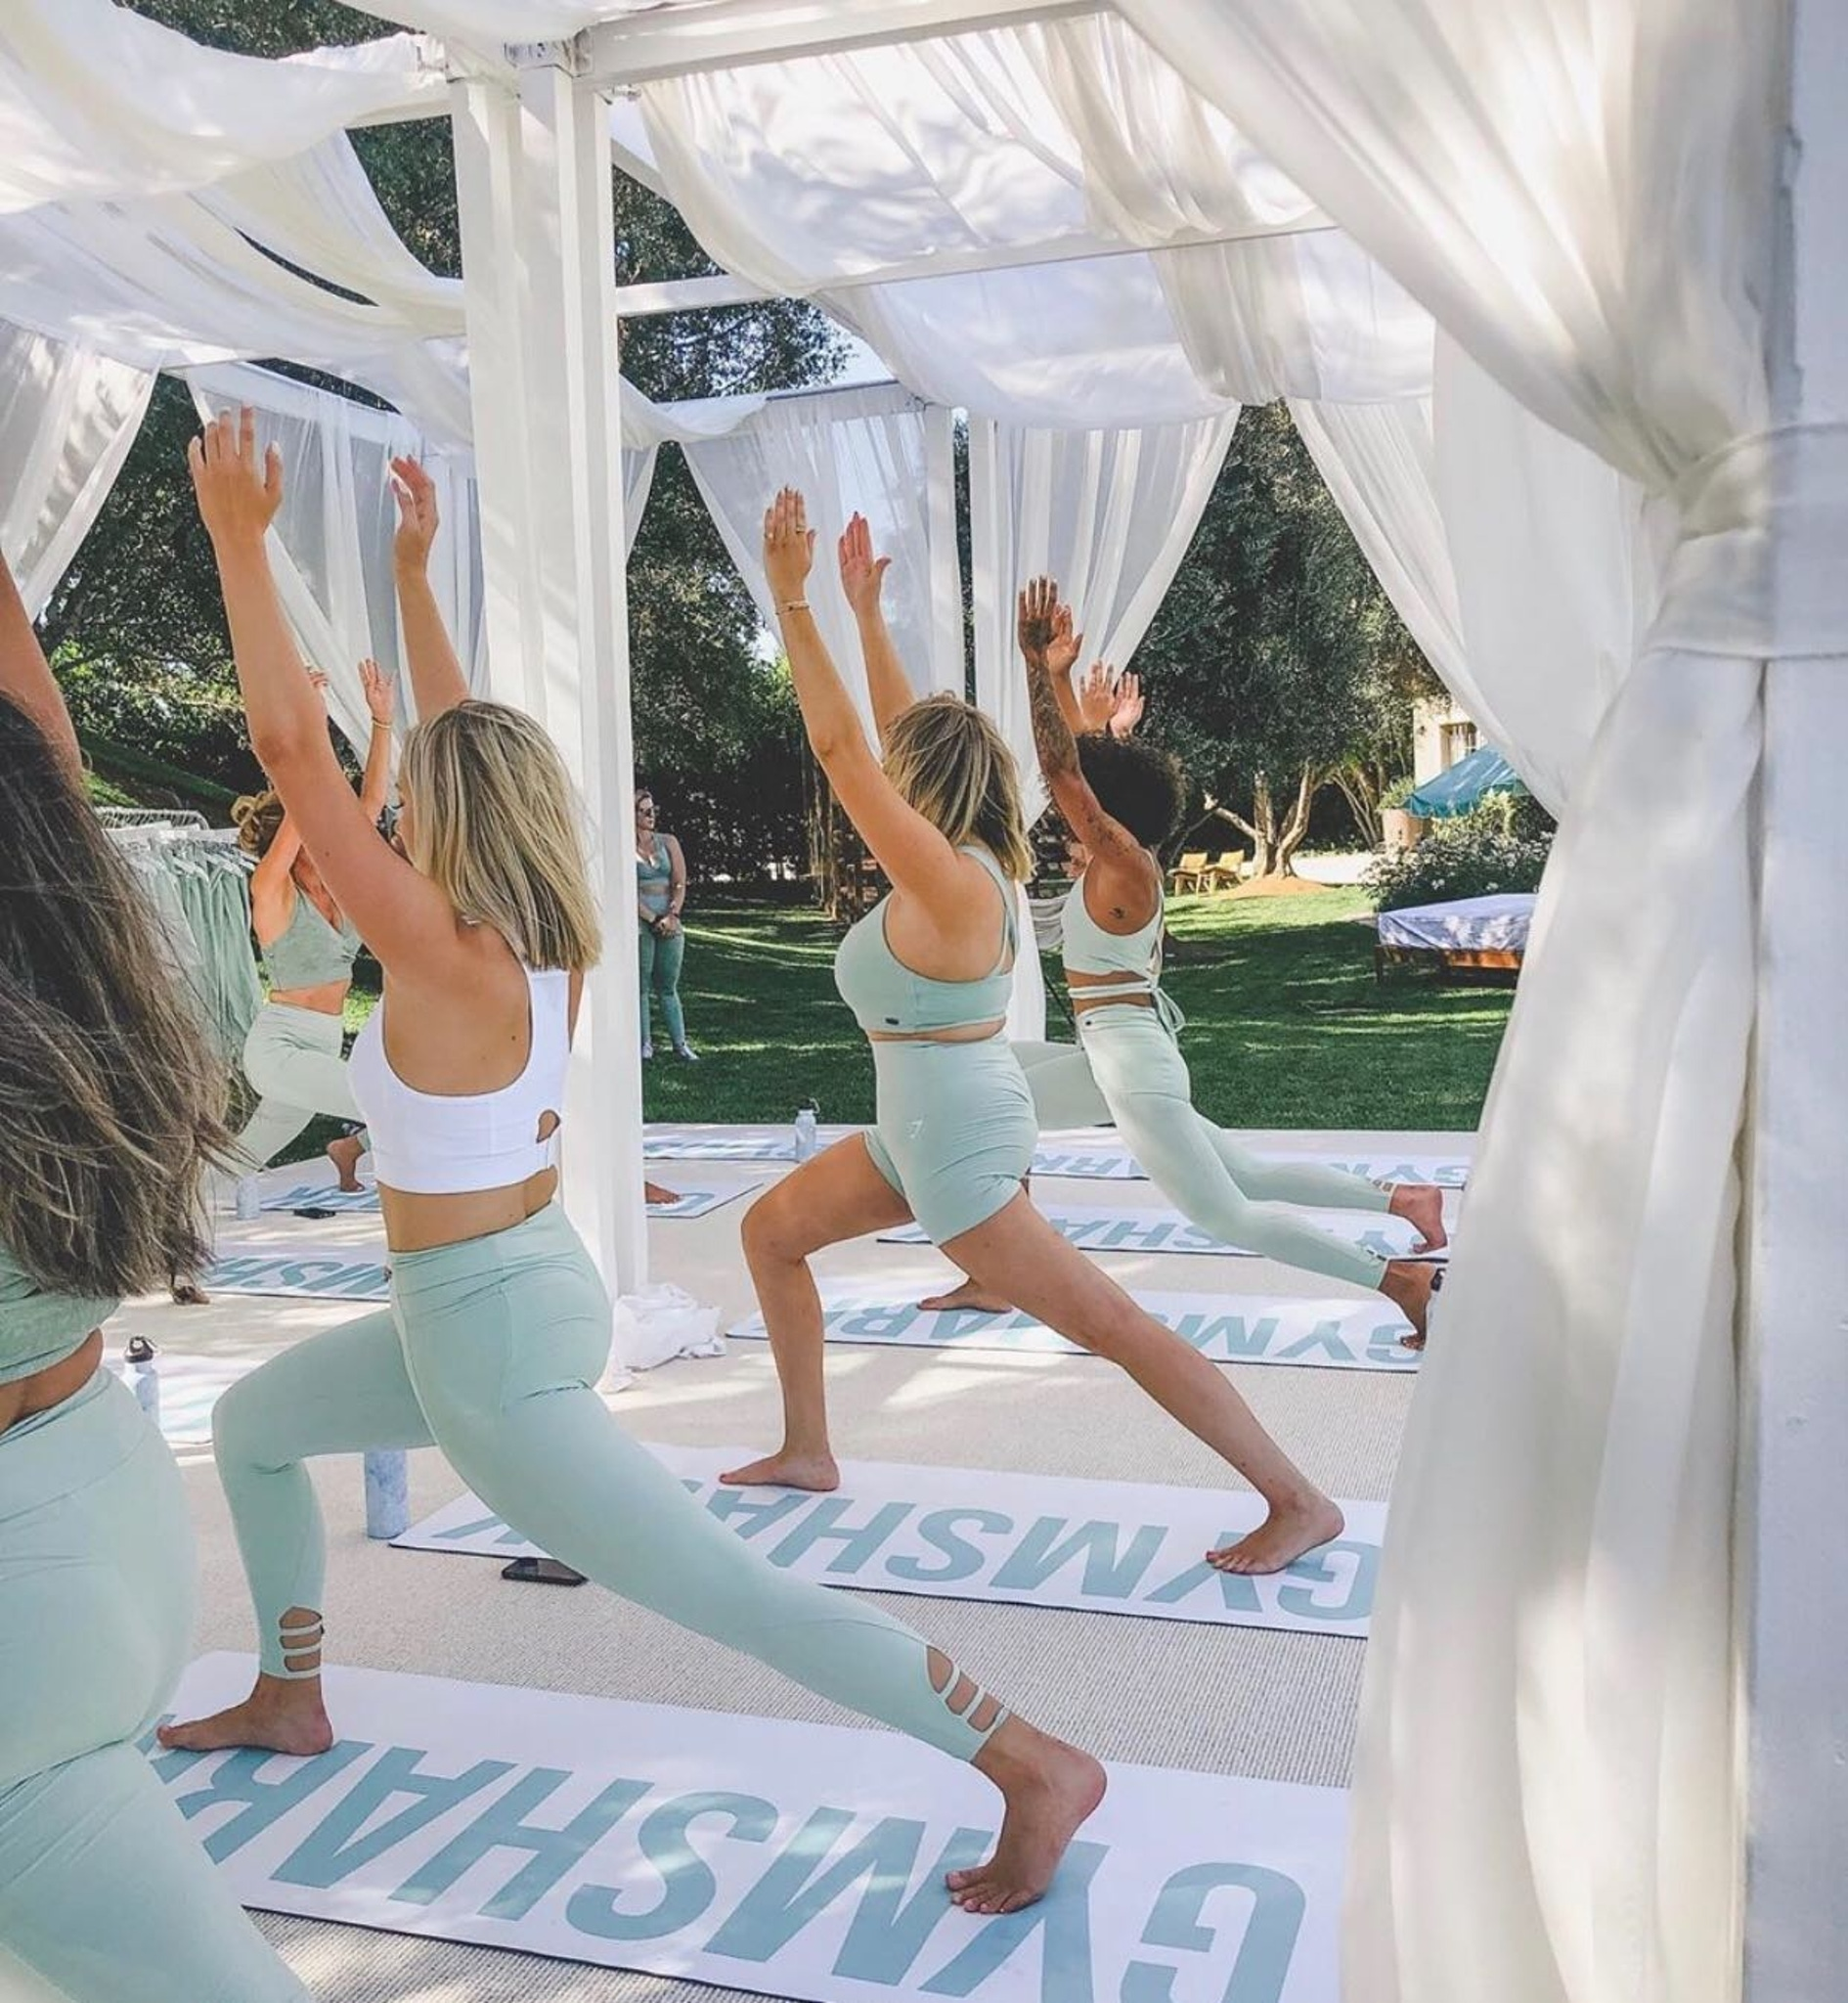 yoga under white cabana at Poosh event in LA